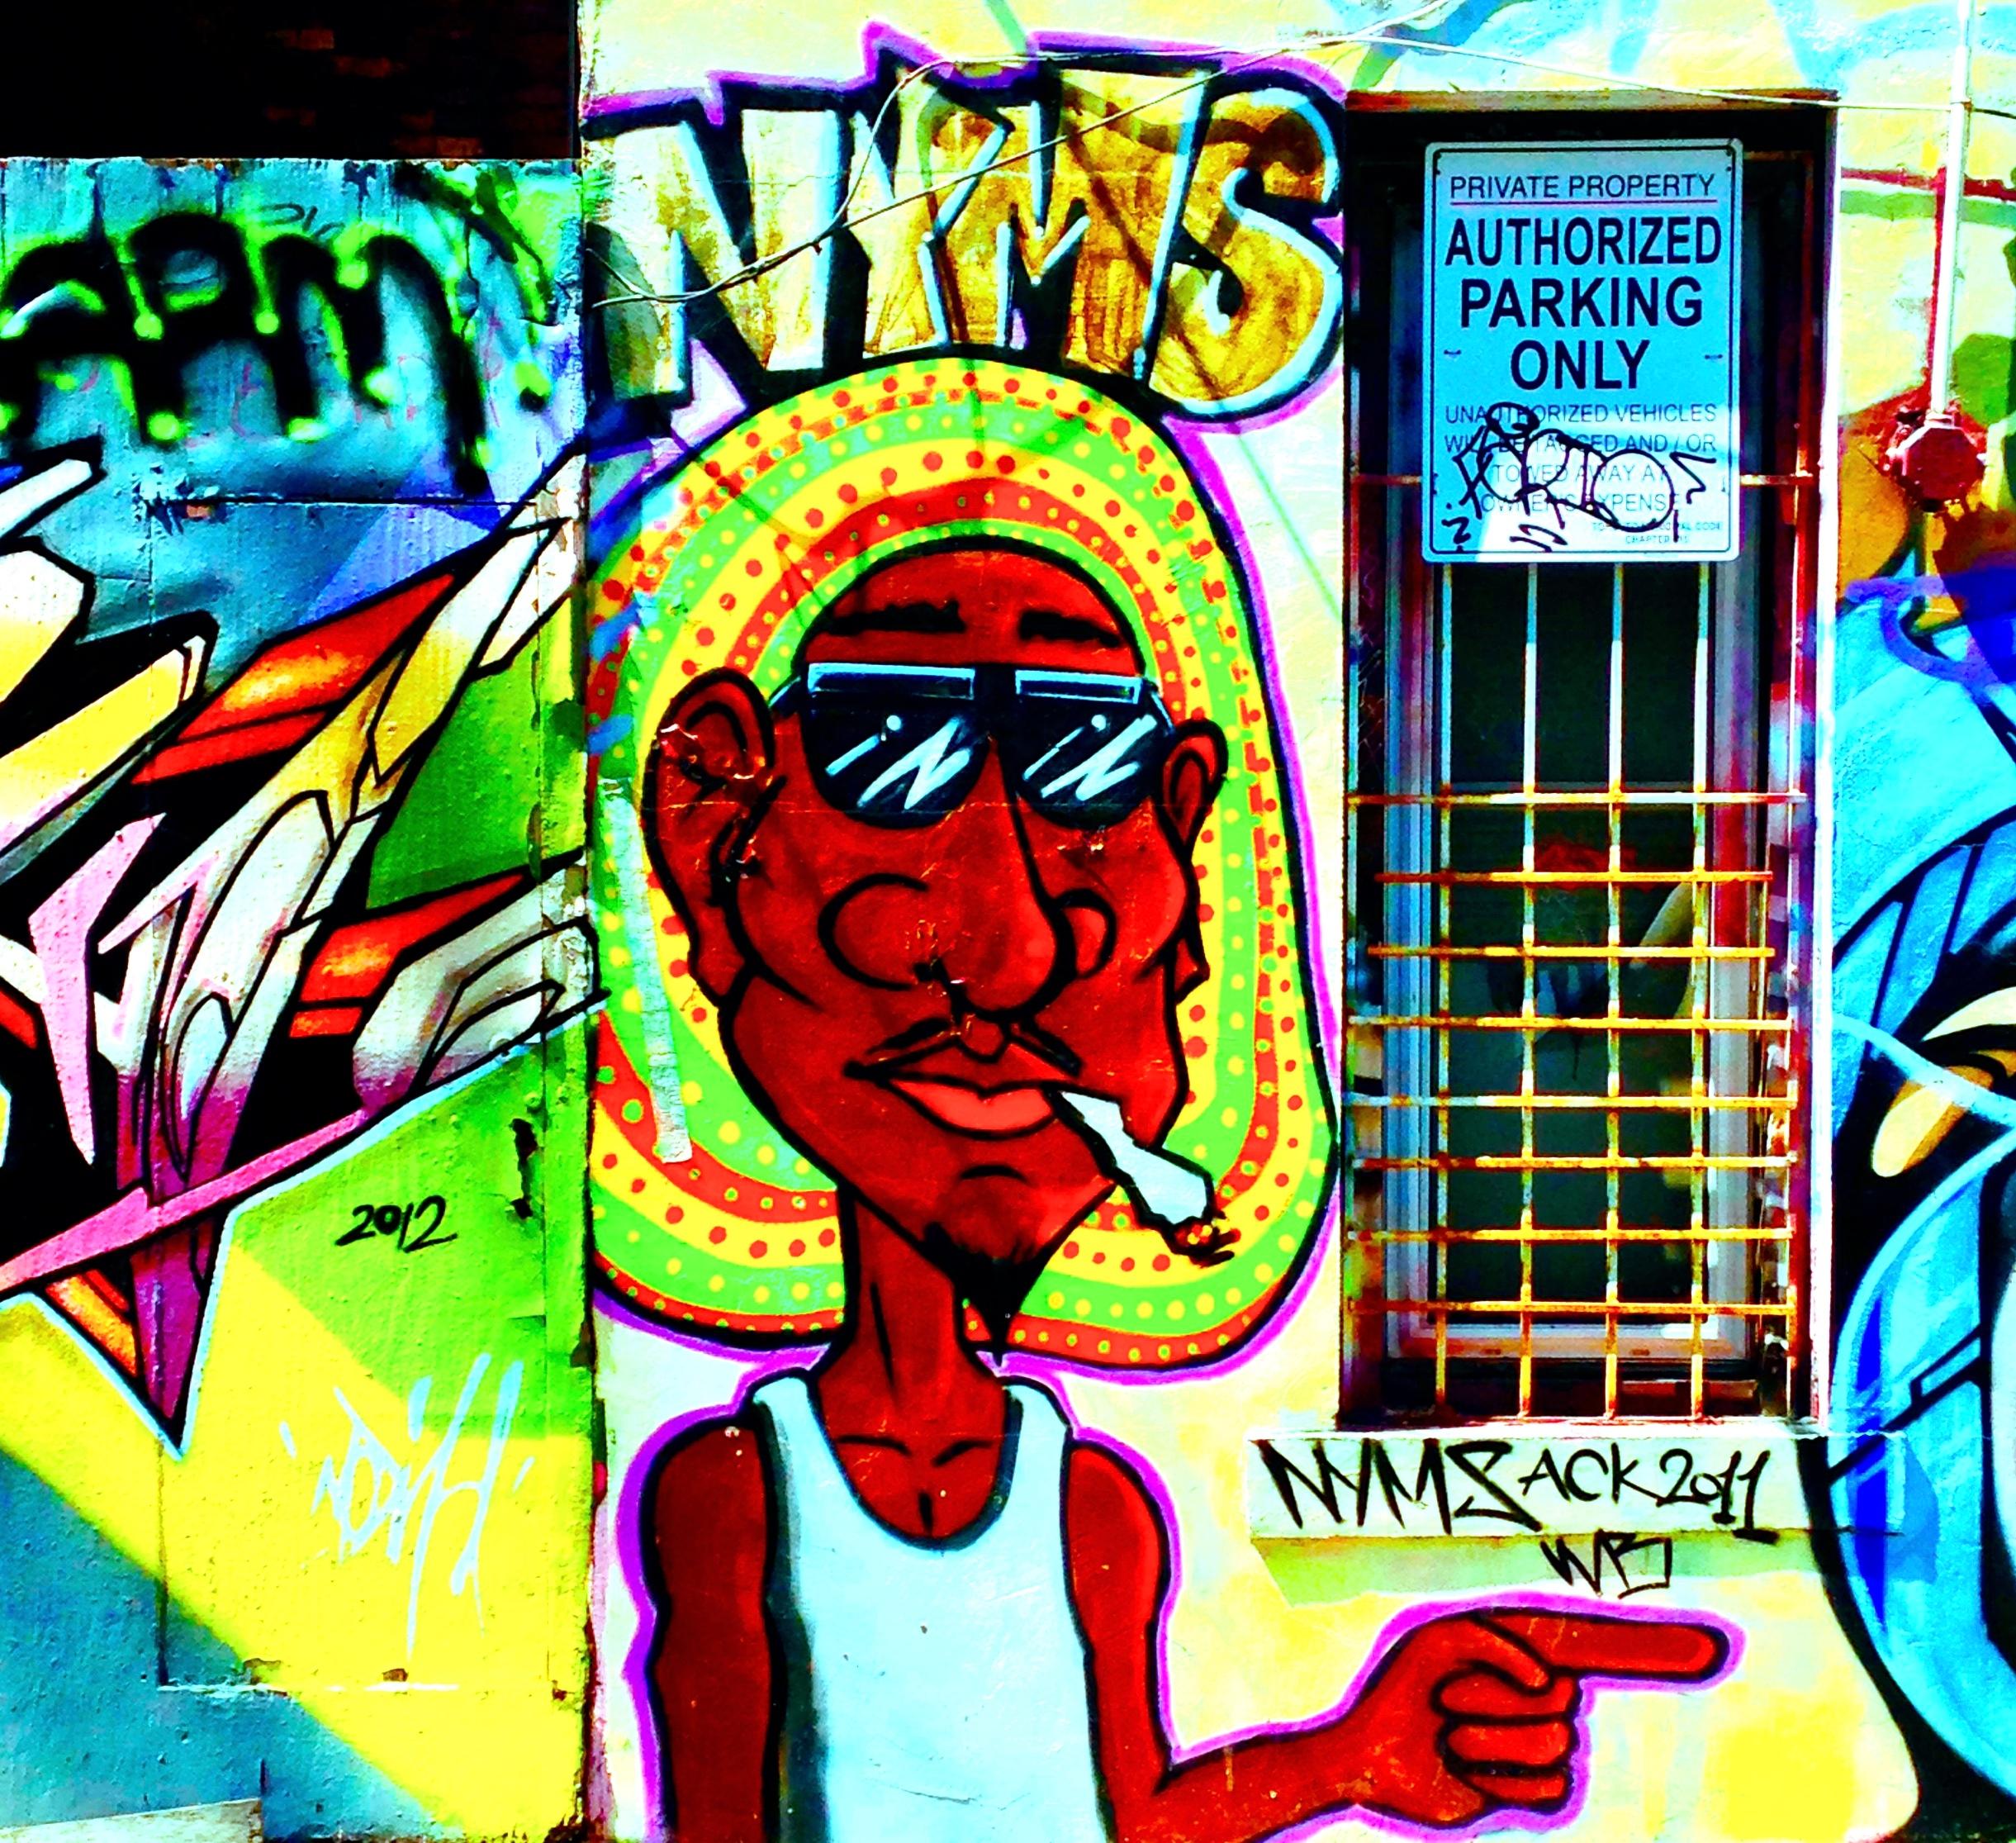 Golden Boy Graffiti image 3